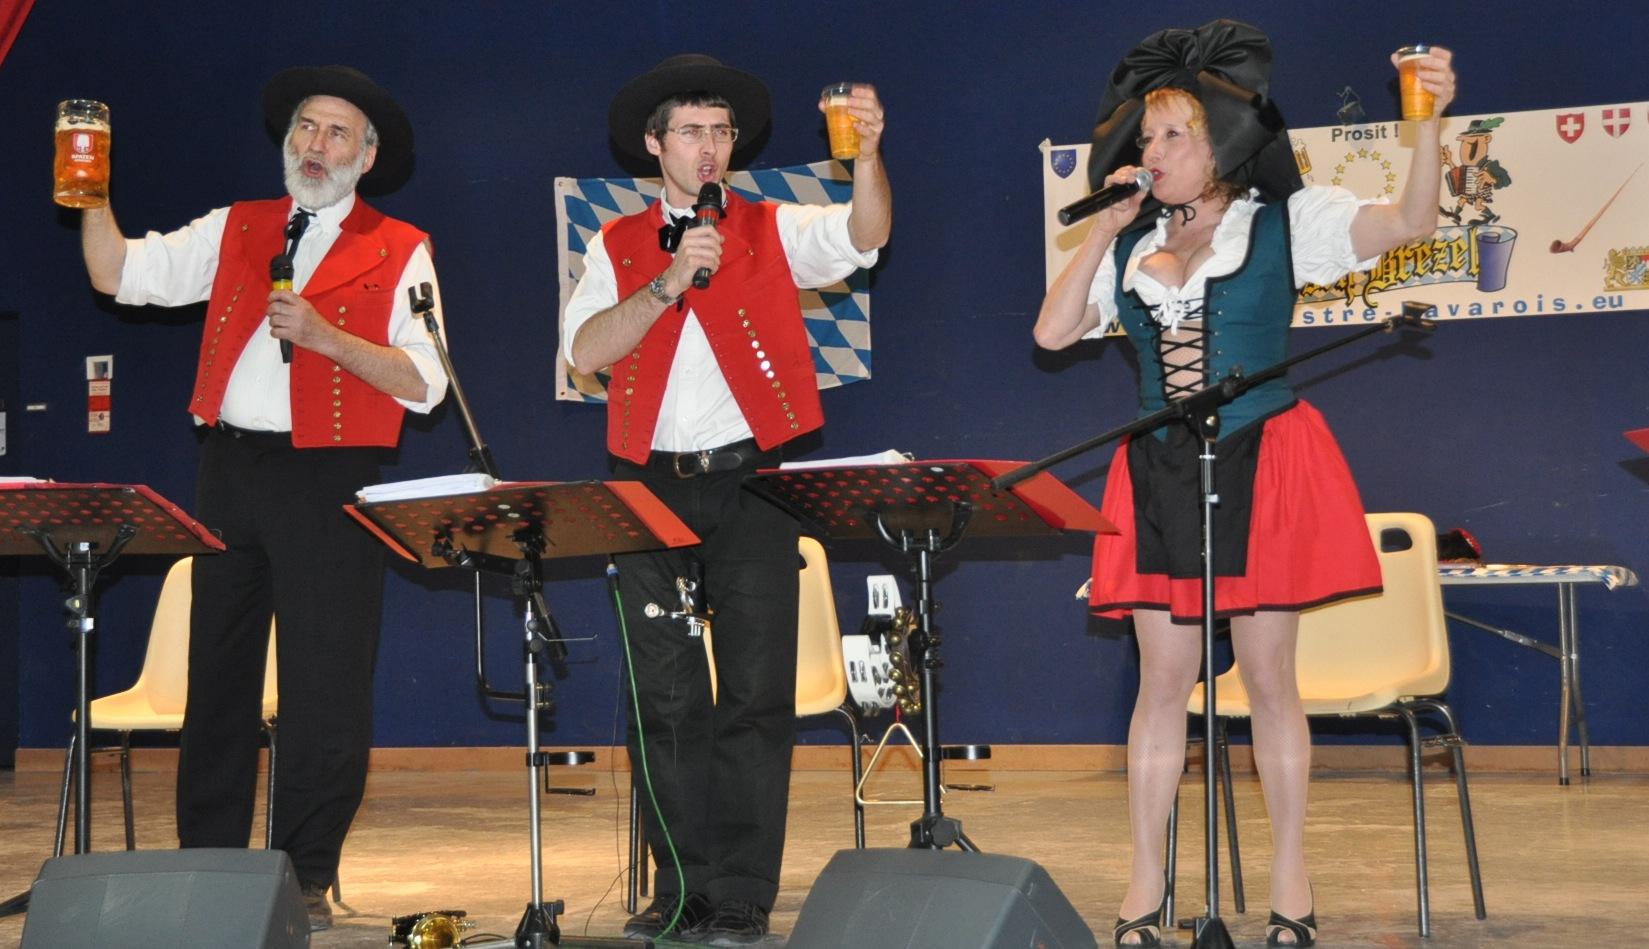 LA-CRAU-2011-Orchestre-alsacien-17